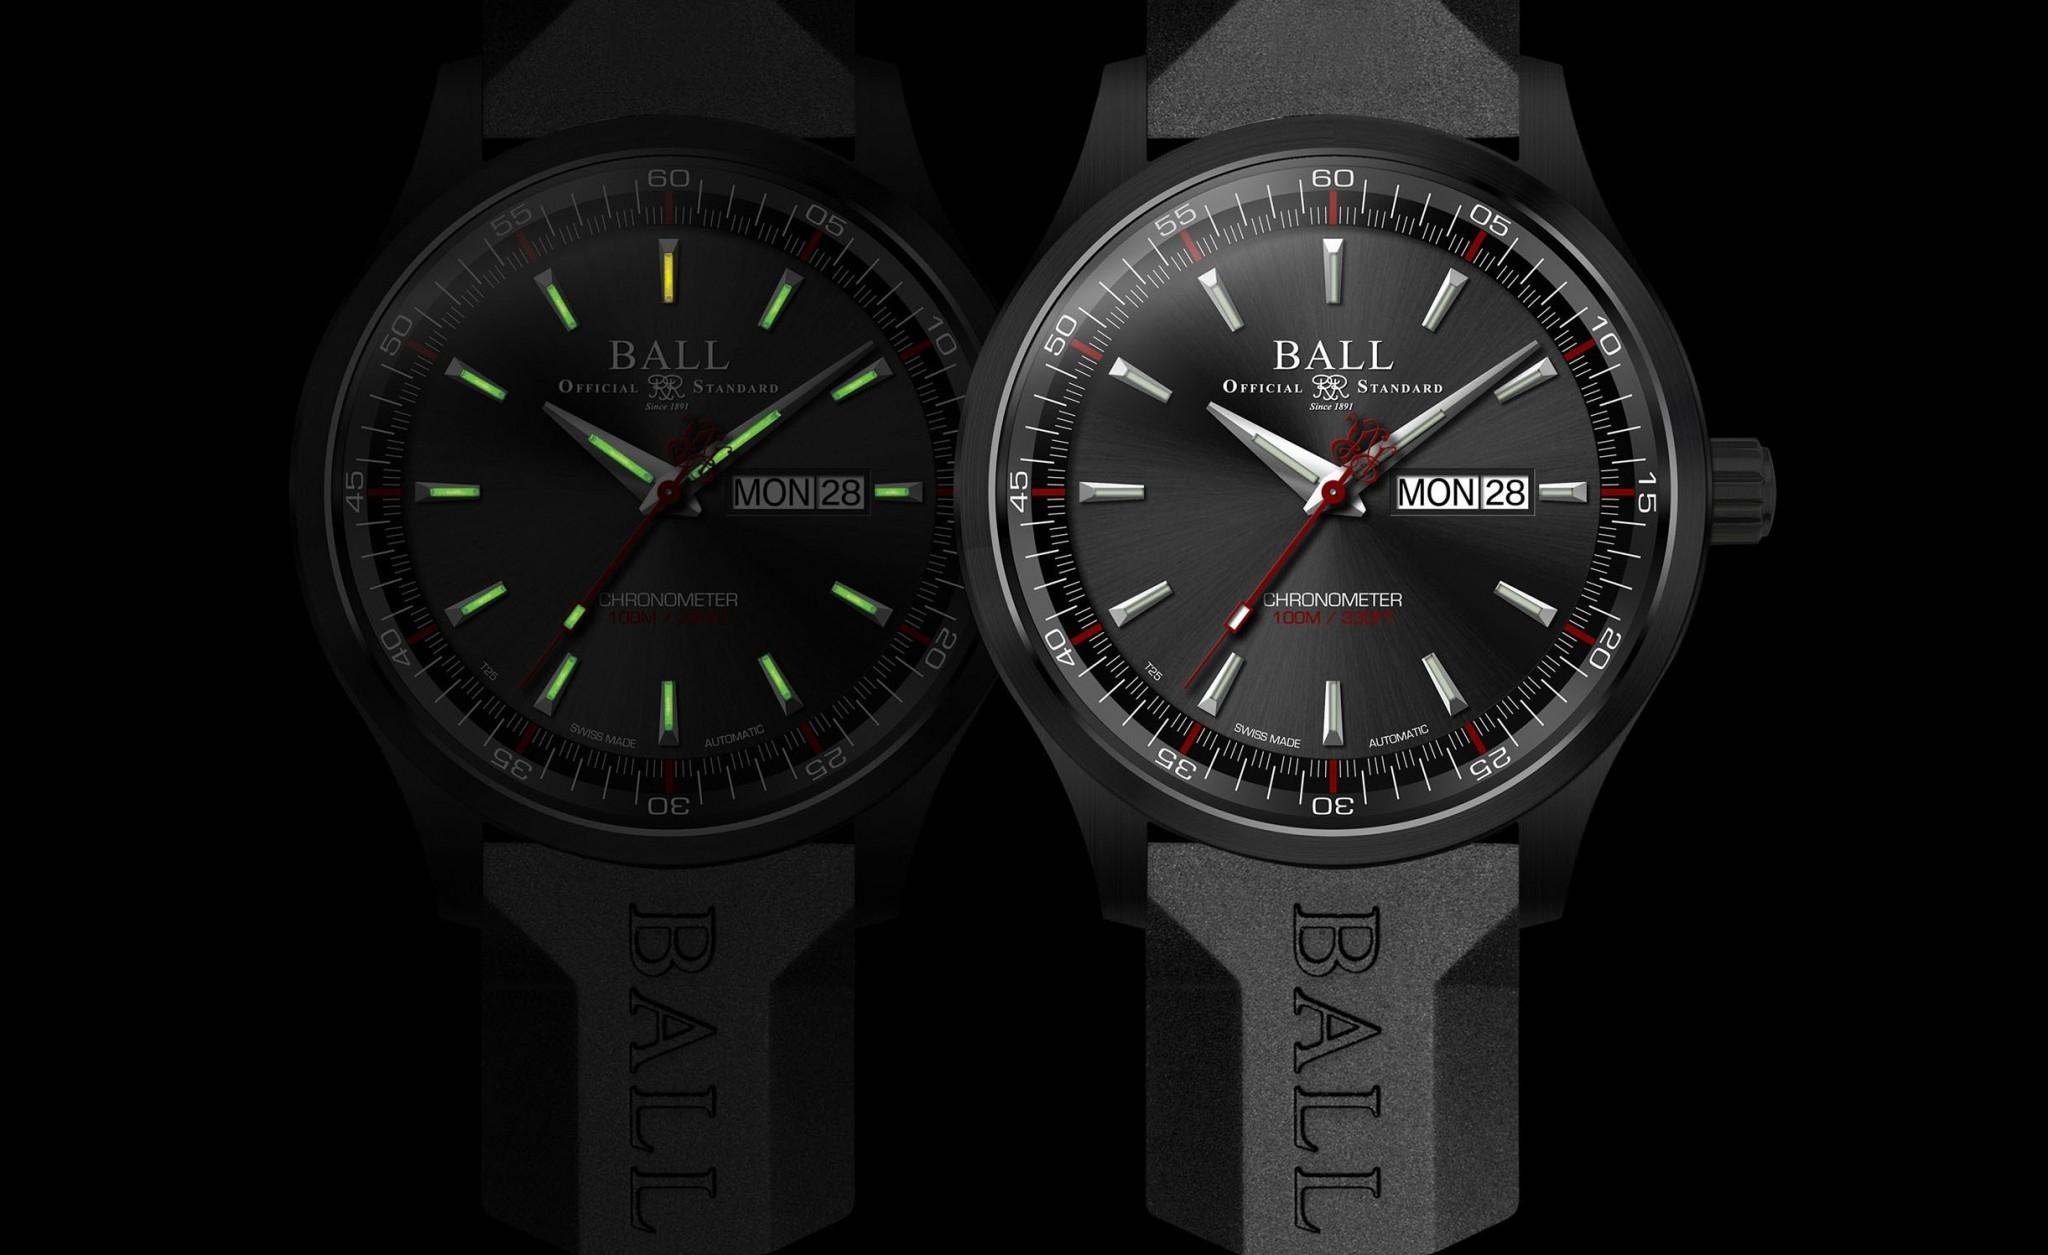 BALL Watch Engineer II Volcano腕錶北中南同步展售,歡迎蒞臨參觀